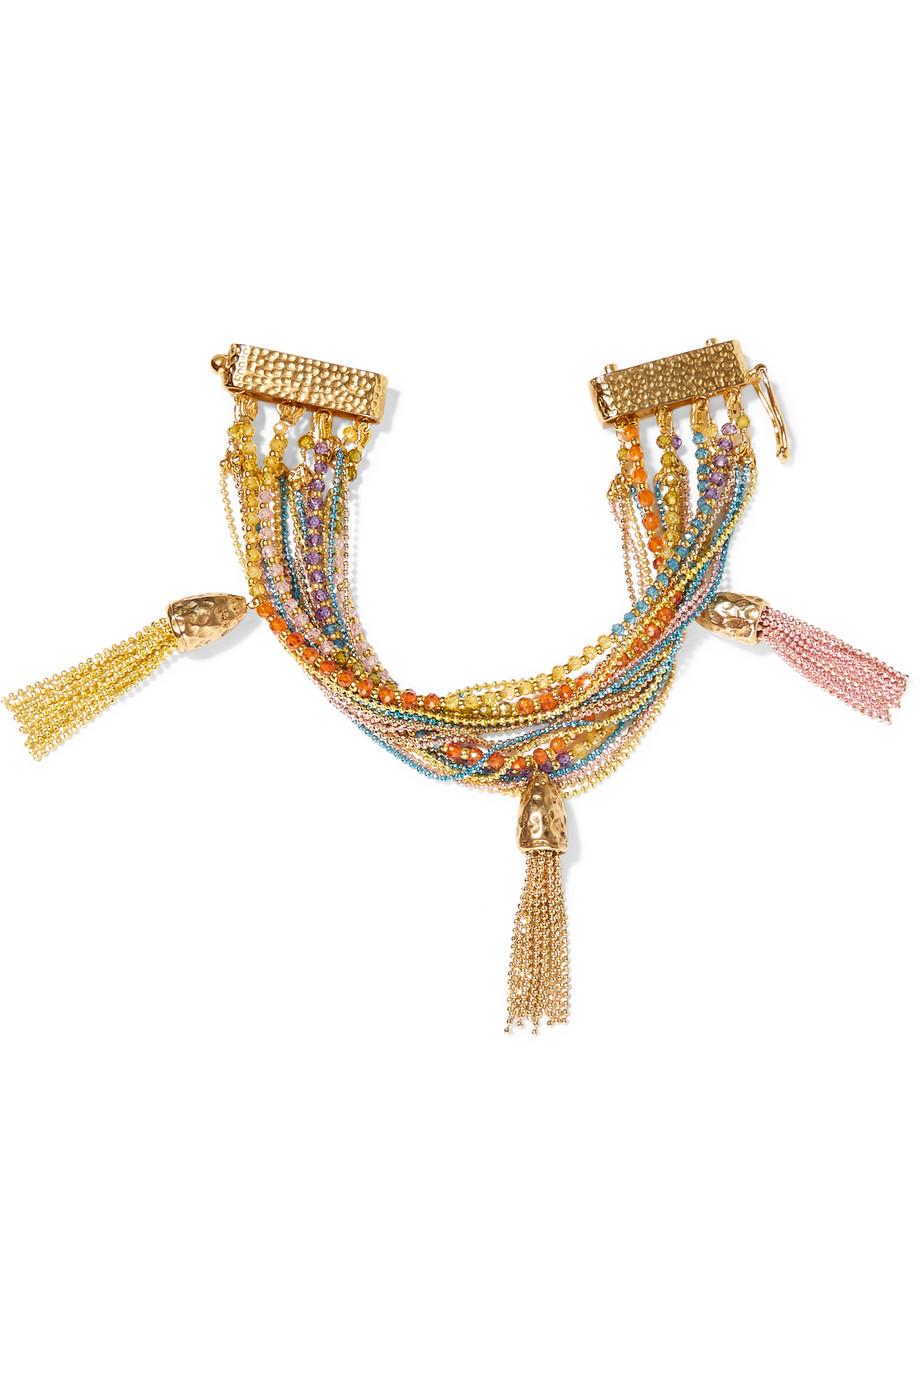 Rosantica Arcobaleno Gold-Tone Cubic Zirconia Bracelet, Women's